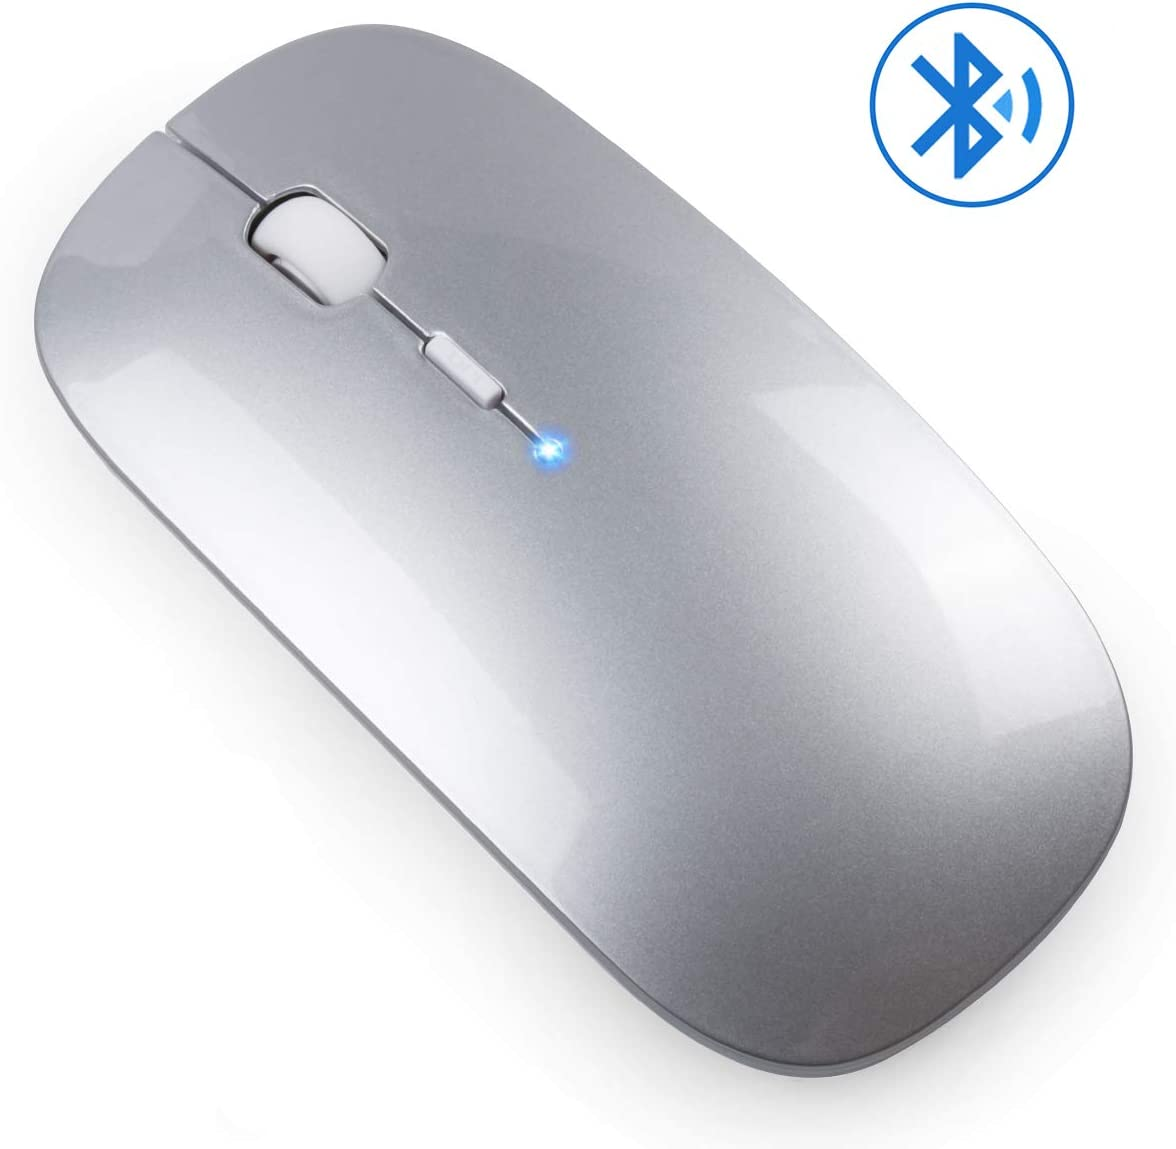 Jaybest Ratón Bluetooth, Ratón Bluetooth sin Receptor 3.0 Mini Ratón para Juegos para Computadora Portátil, PC, Computadora Portátil, Computadora con Sistema Operativo Windows/Android(Plata)